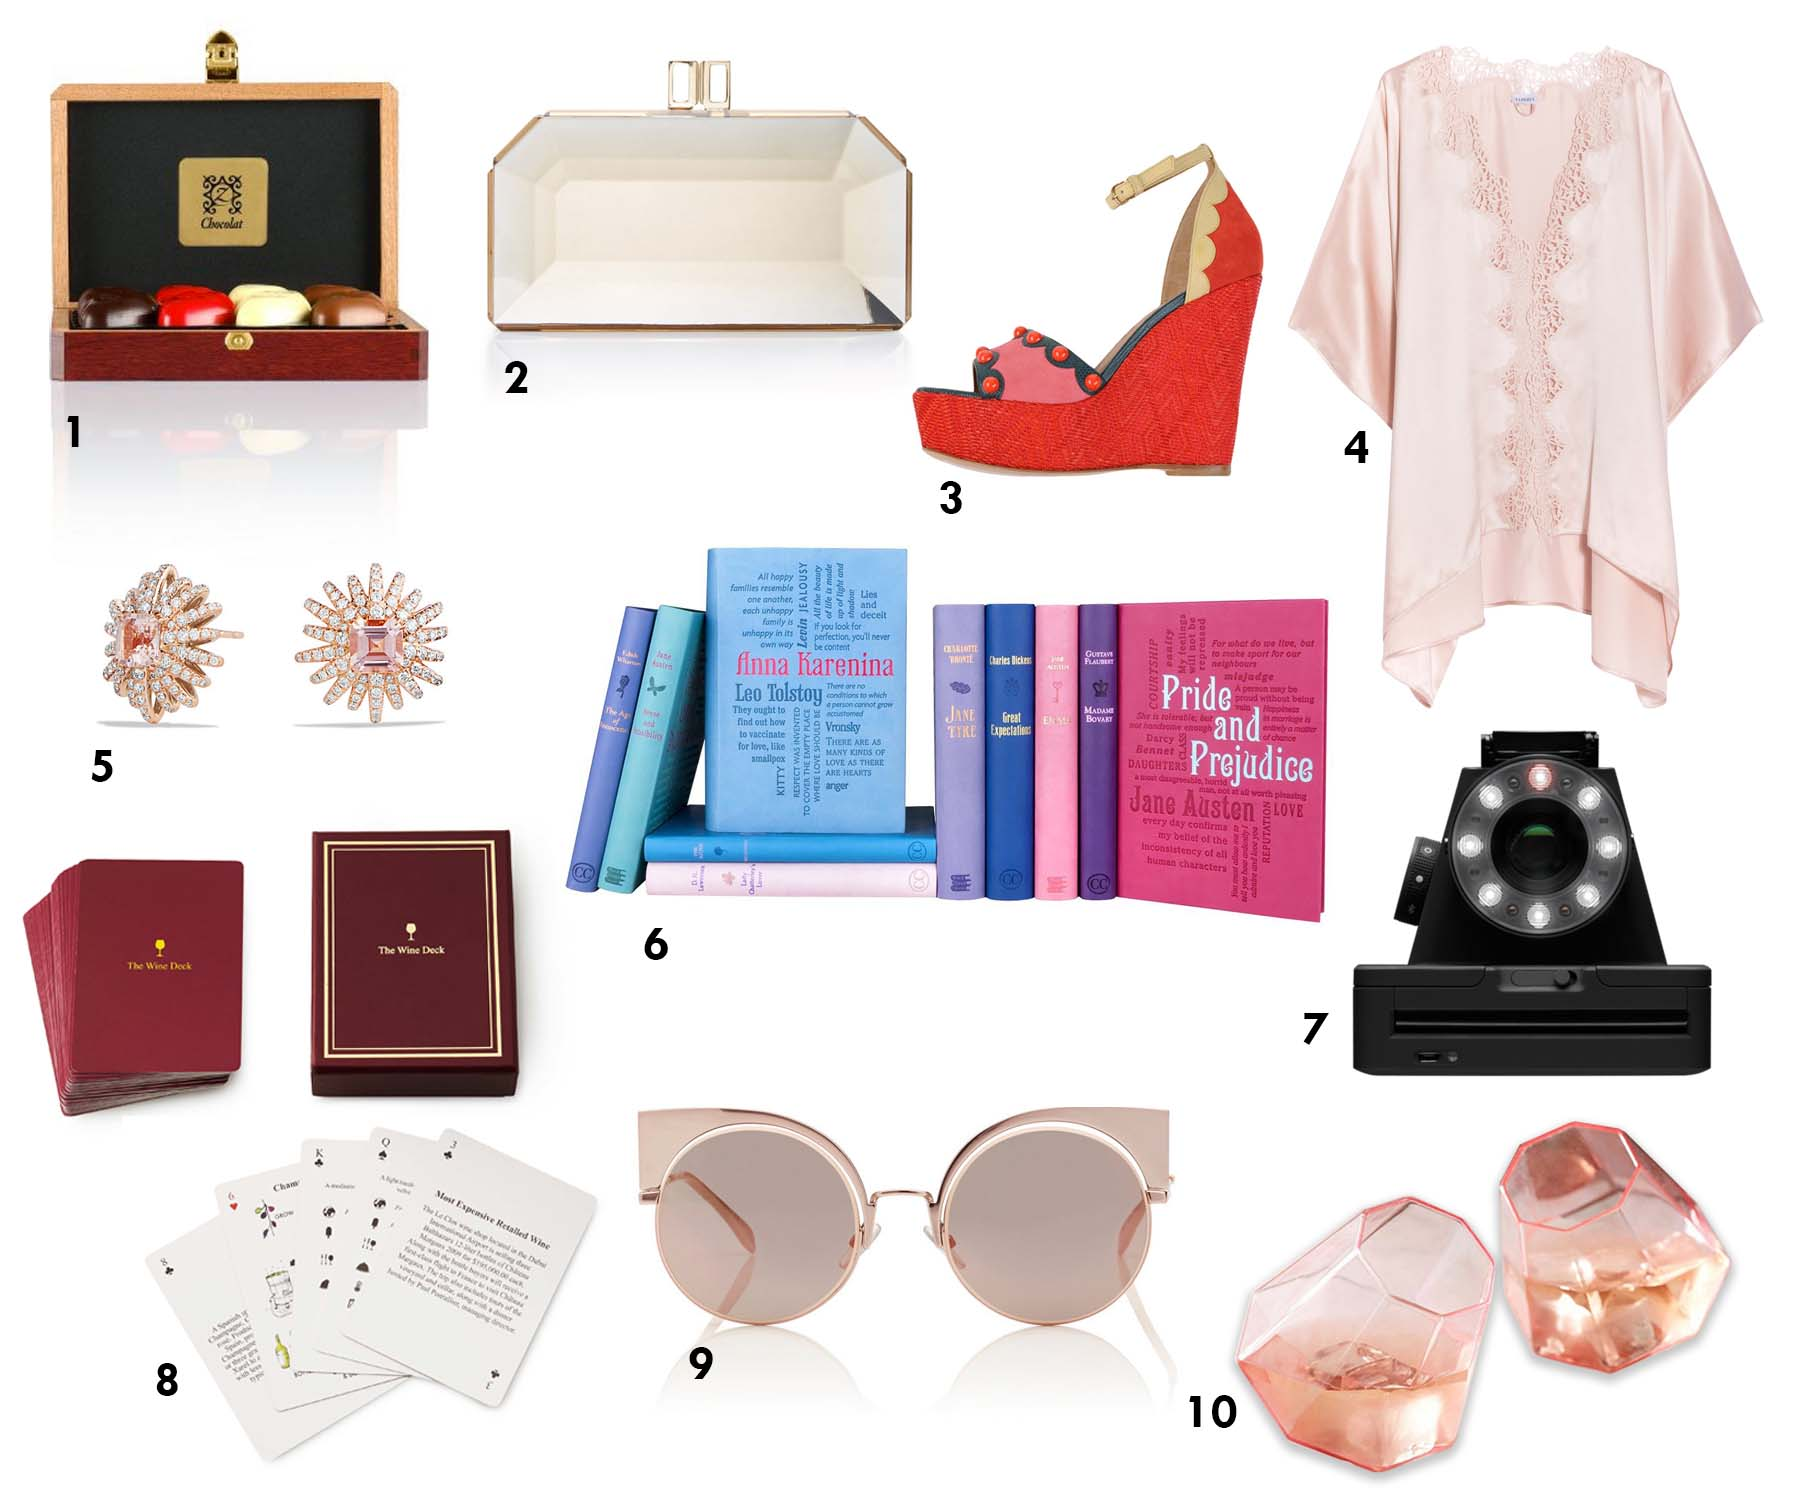 Valentine's Day C'est La VIE 2017 items